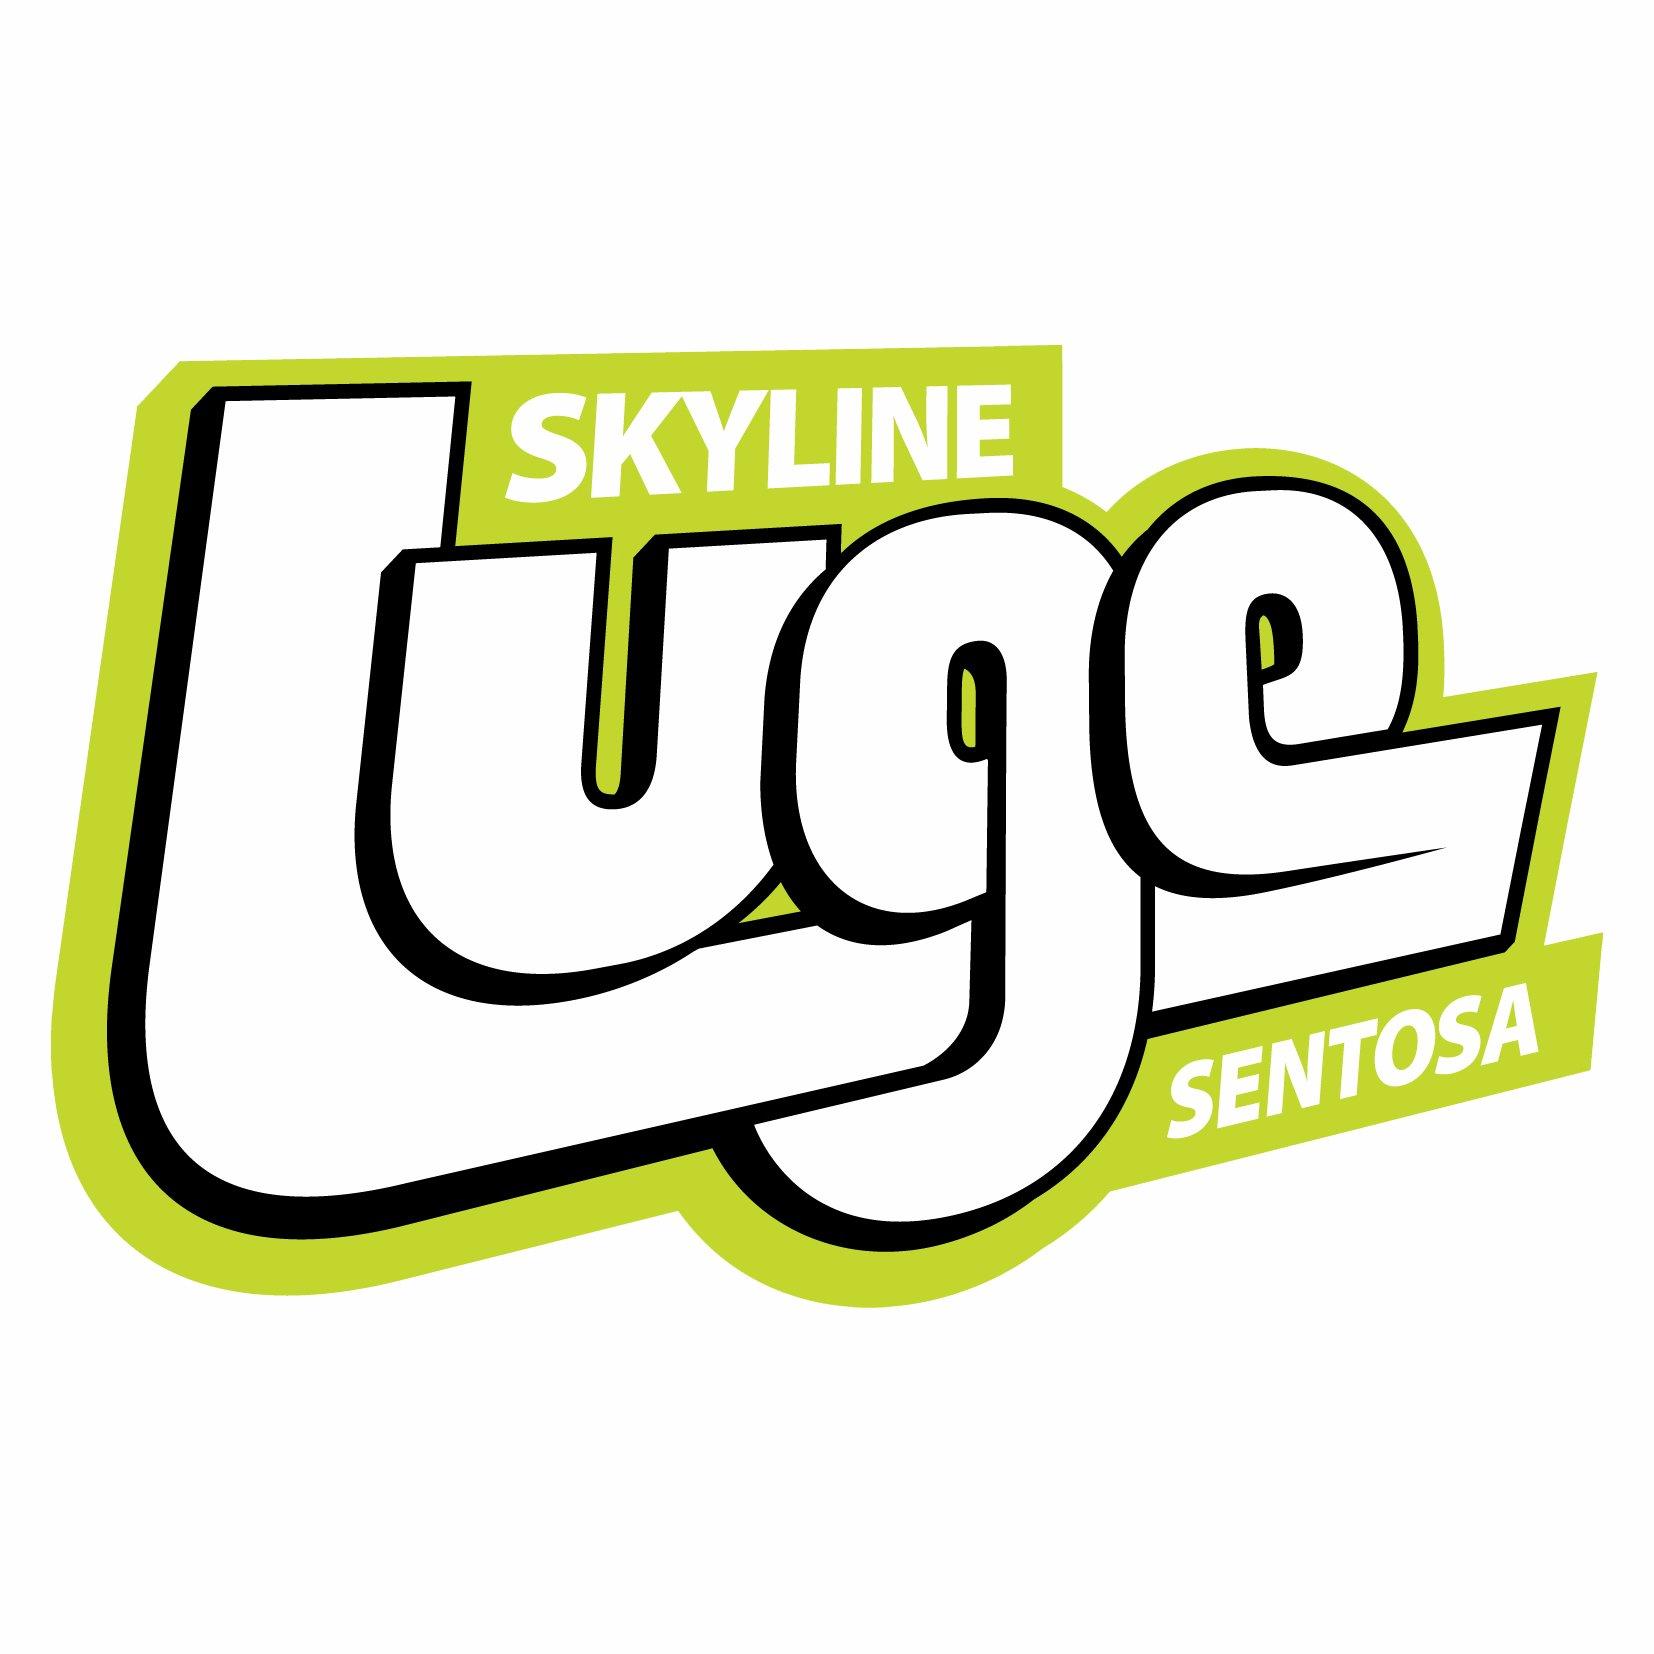 Skyline Luge Sentosa (@skylinelugeSEN).